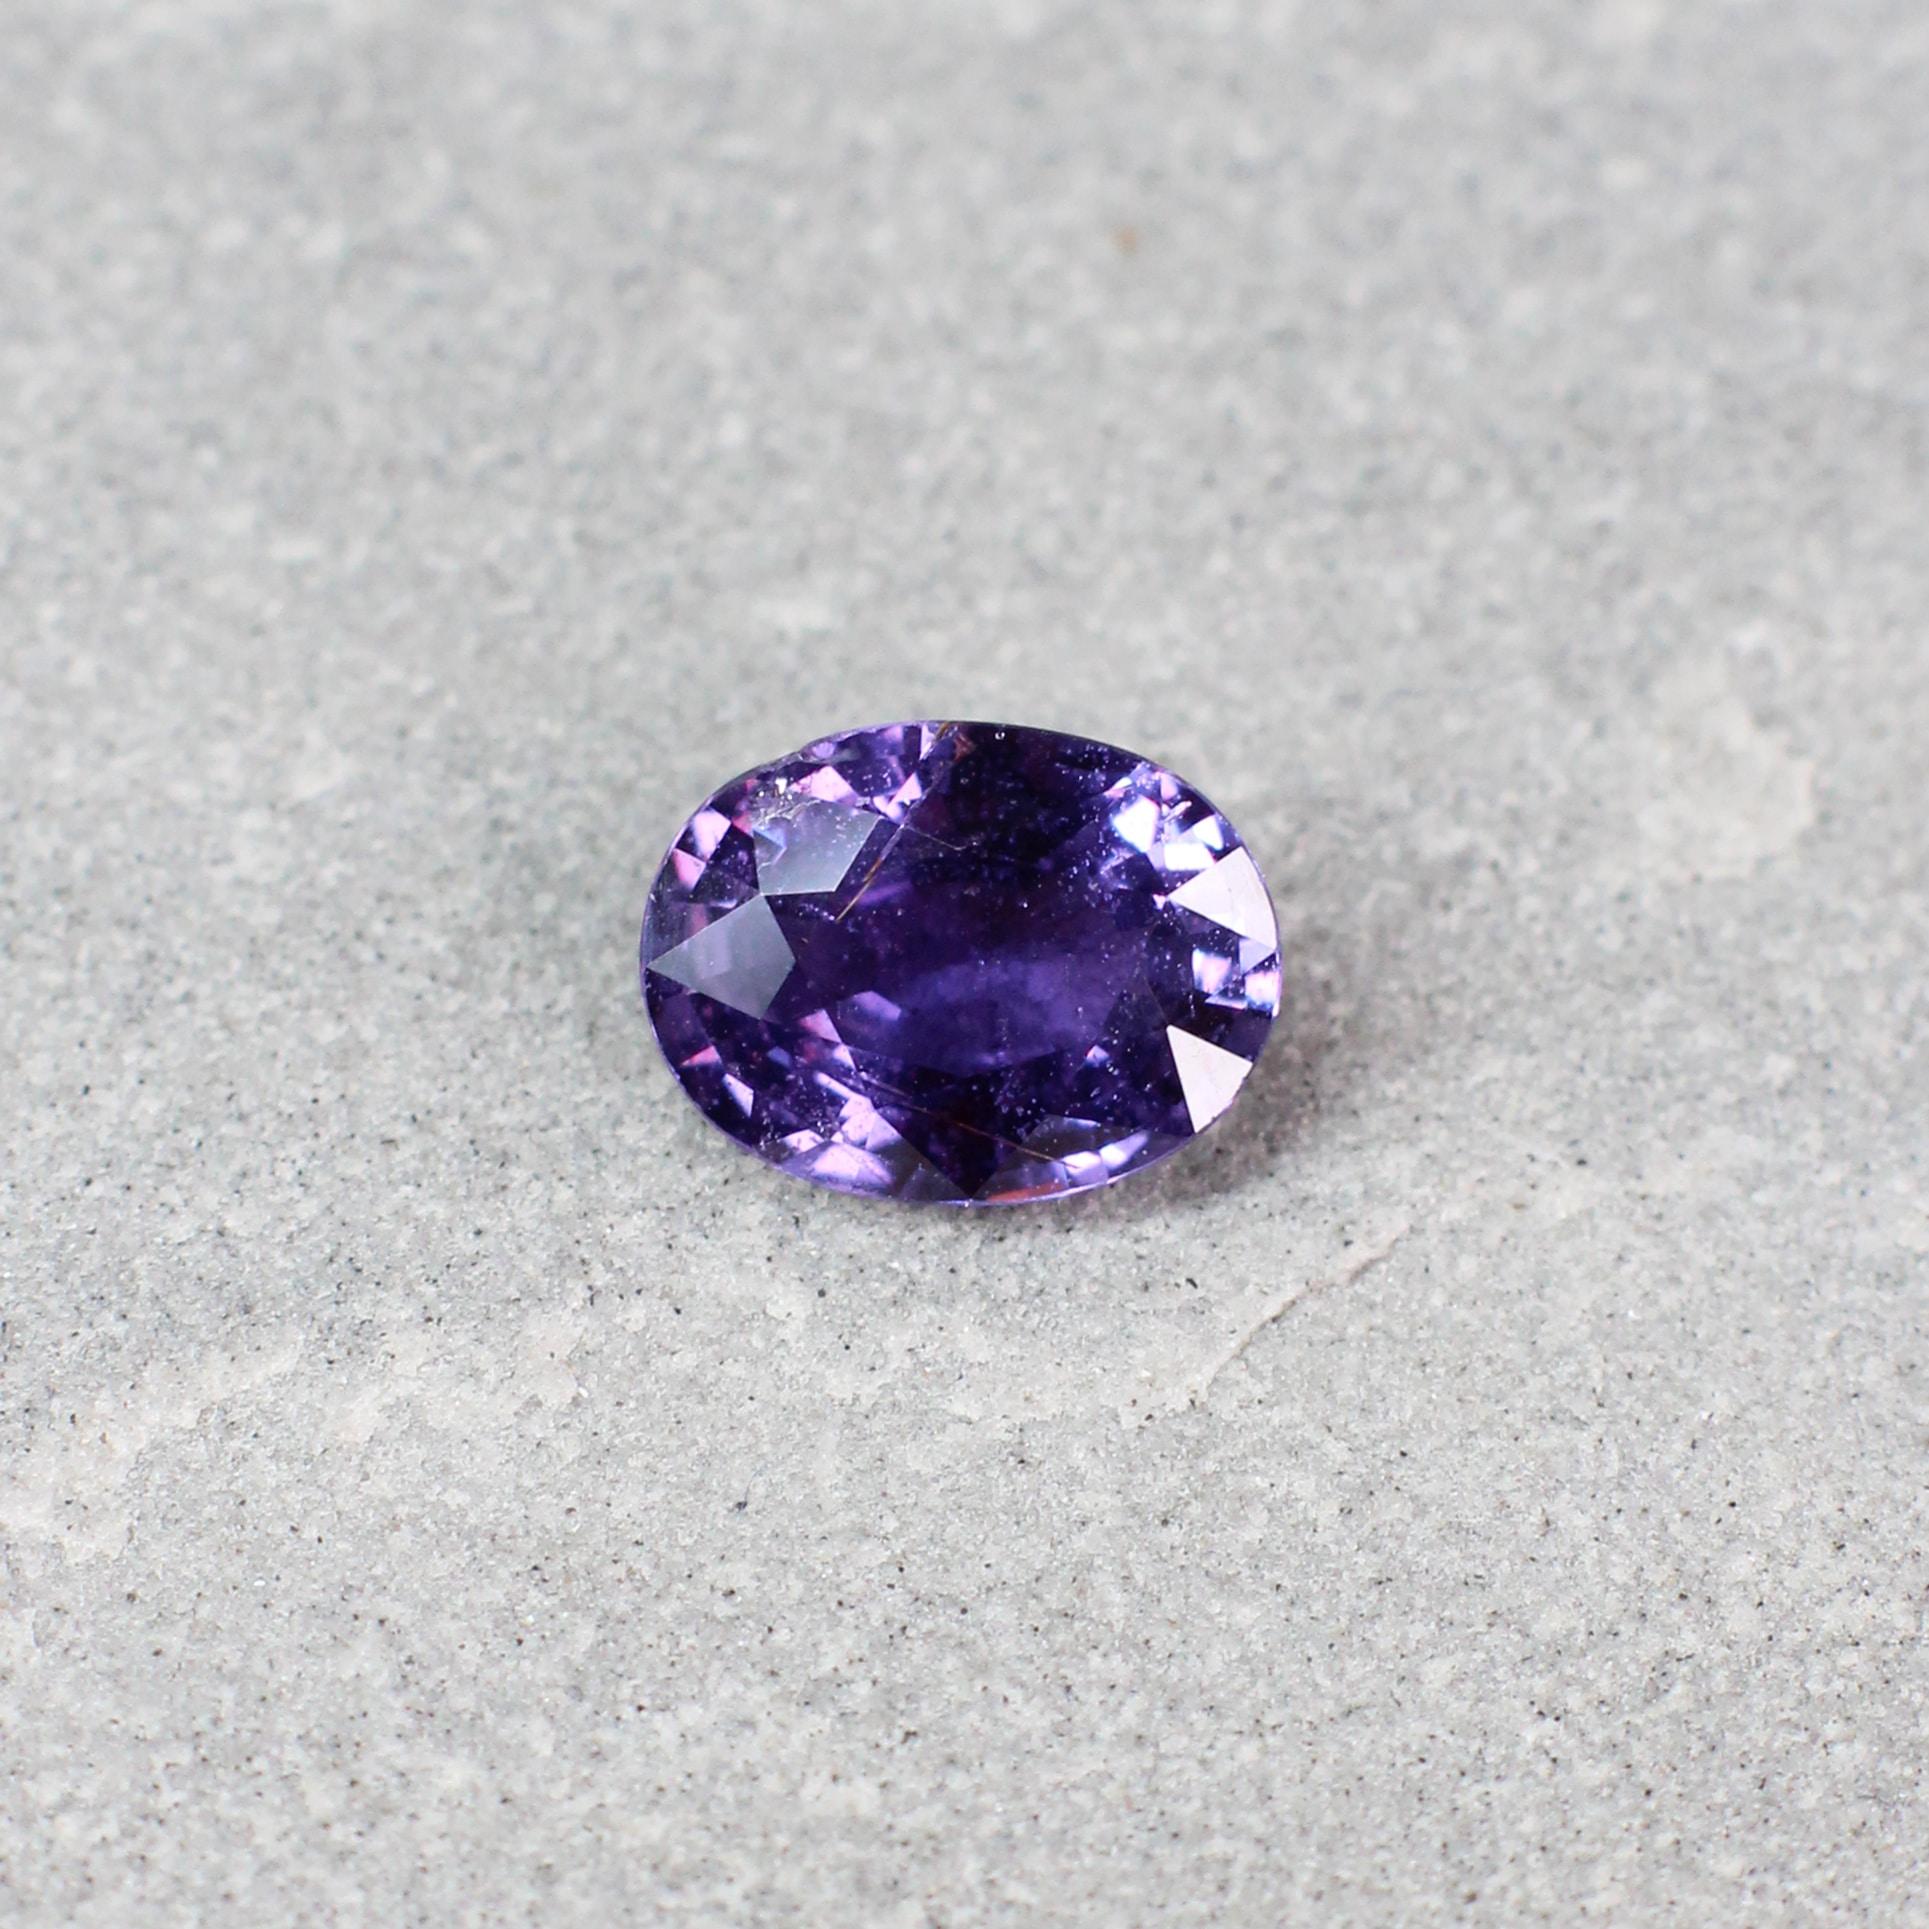 1.44 ct purple oval sapphire